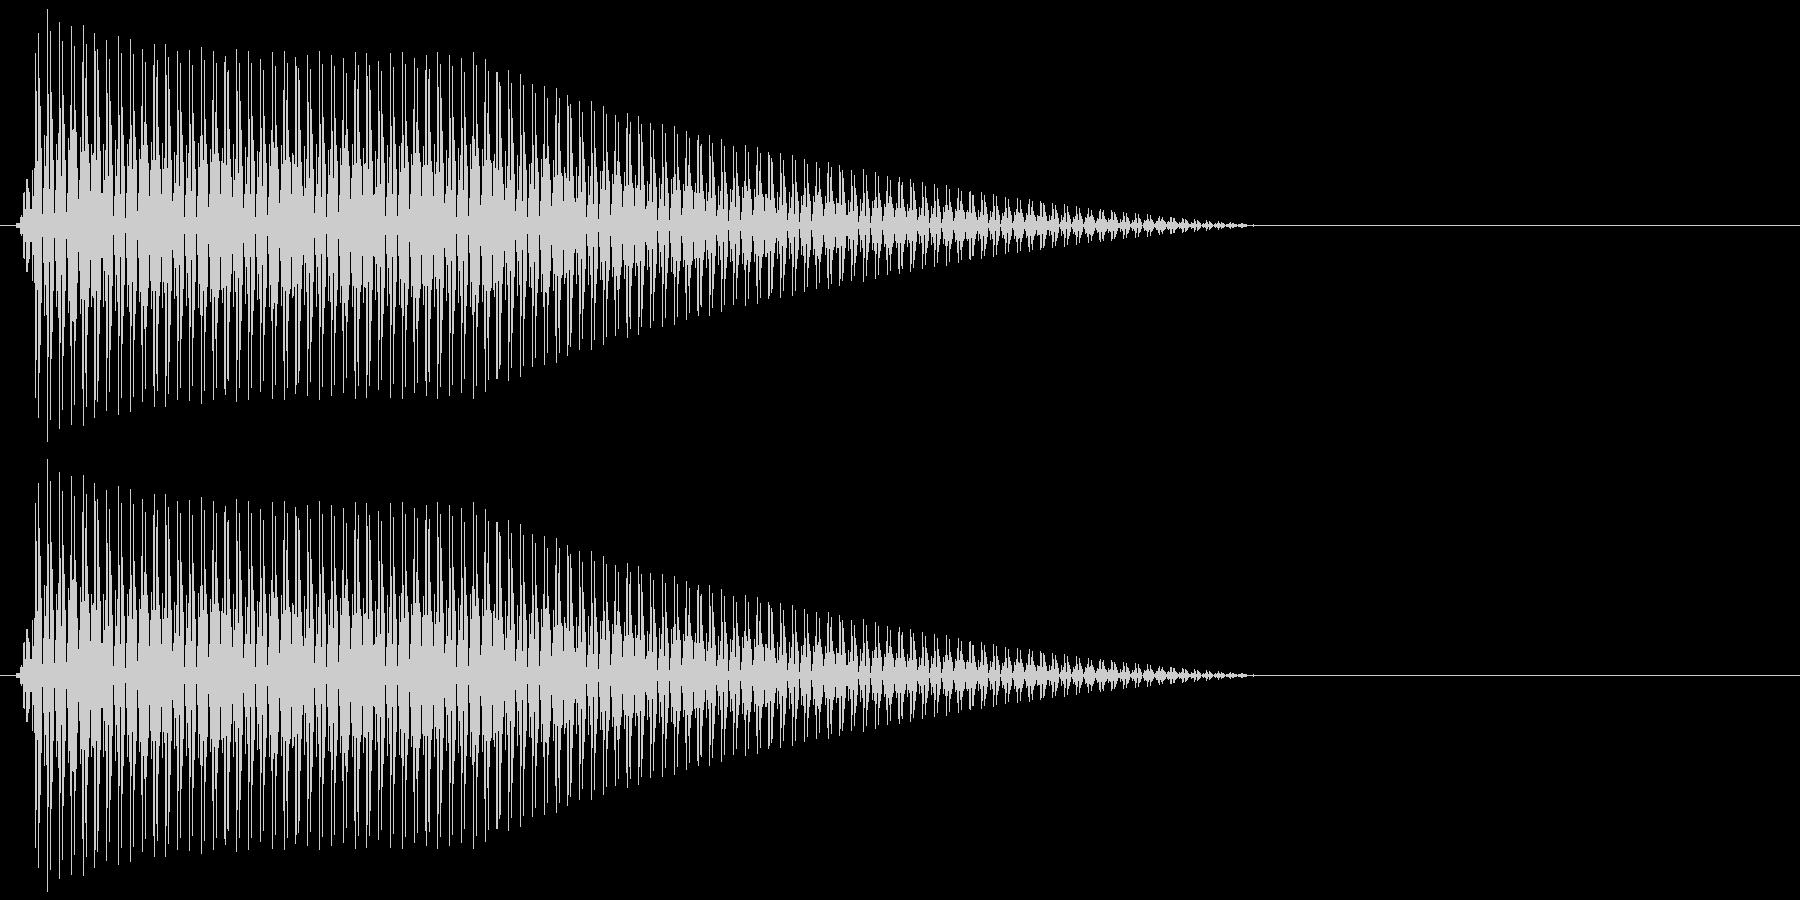 OctaveCom アプリ用タッチ音11の未再生の波形